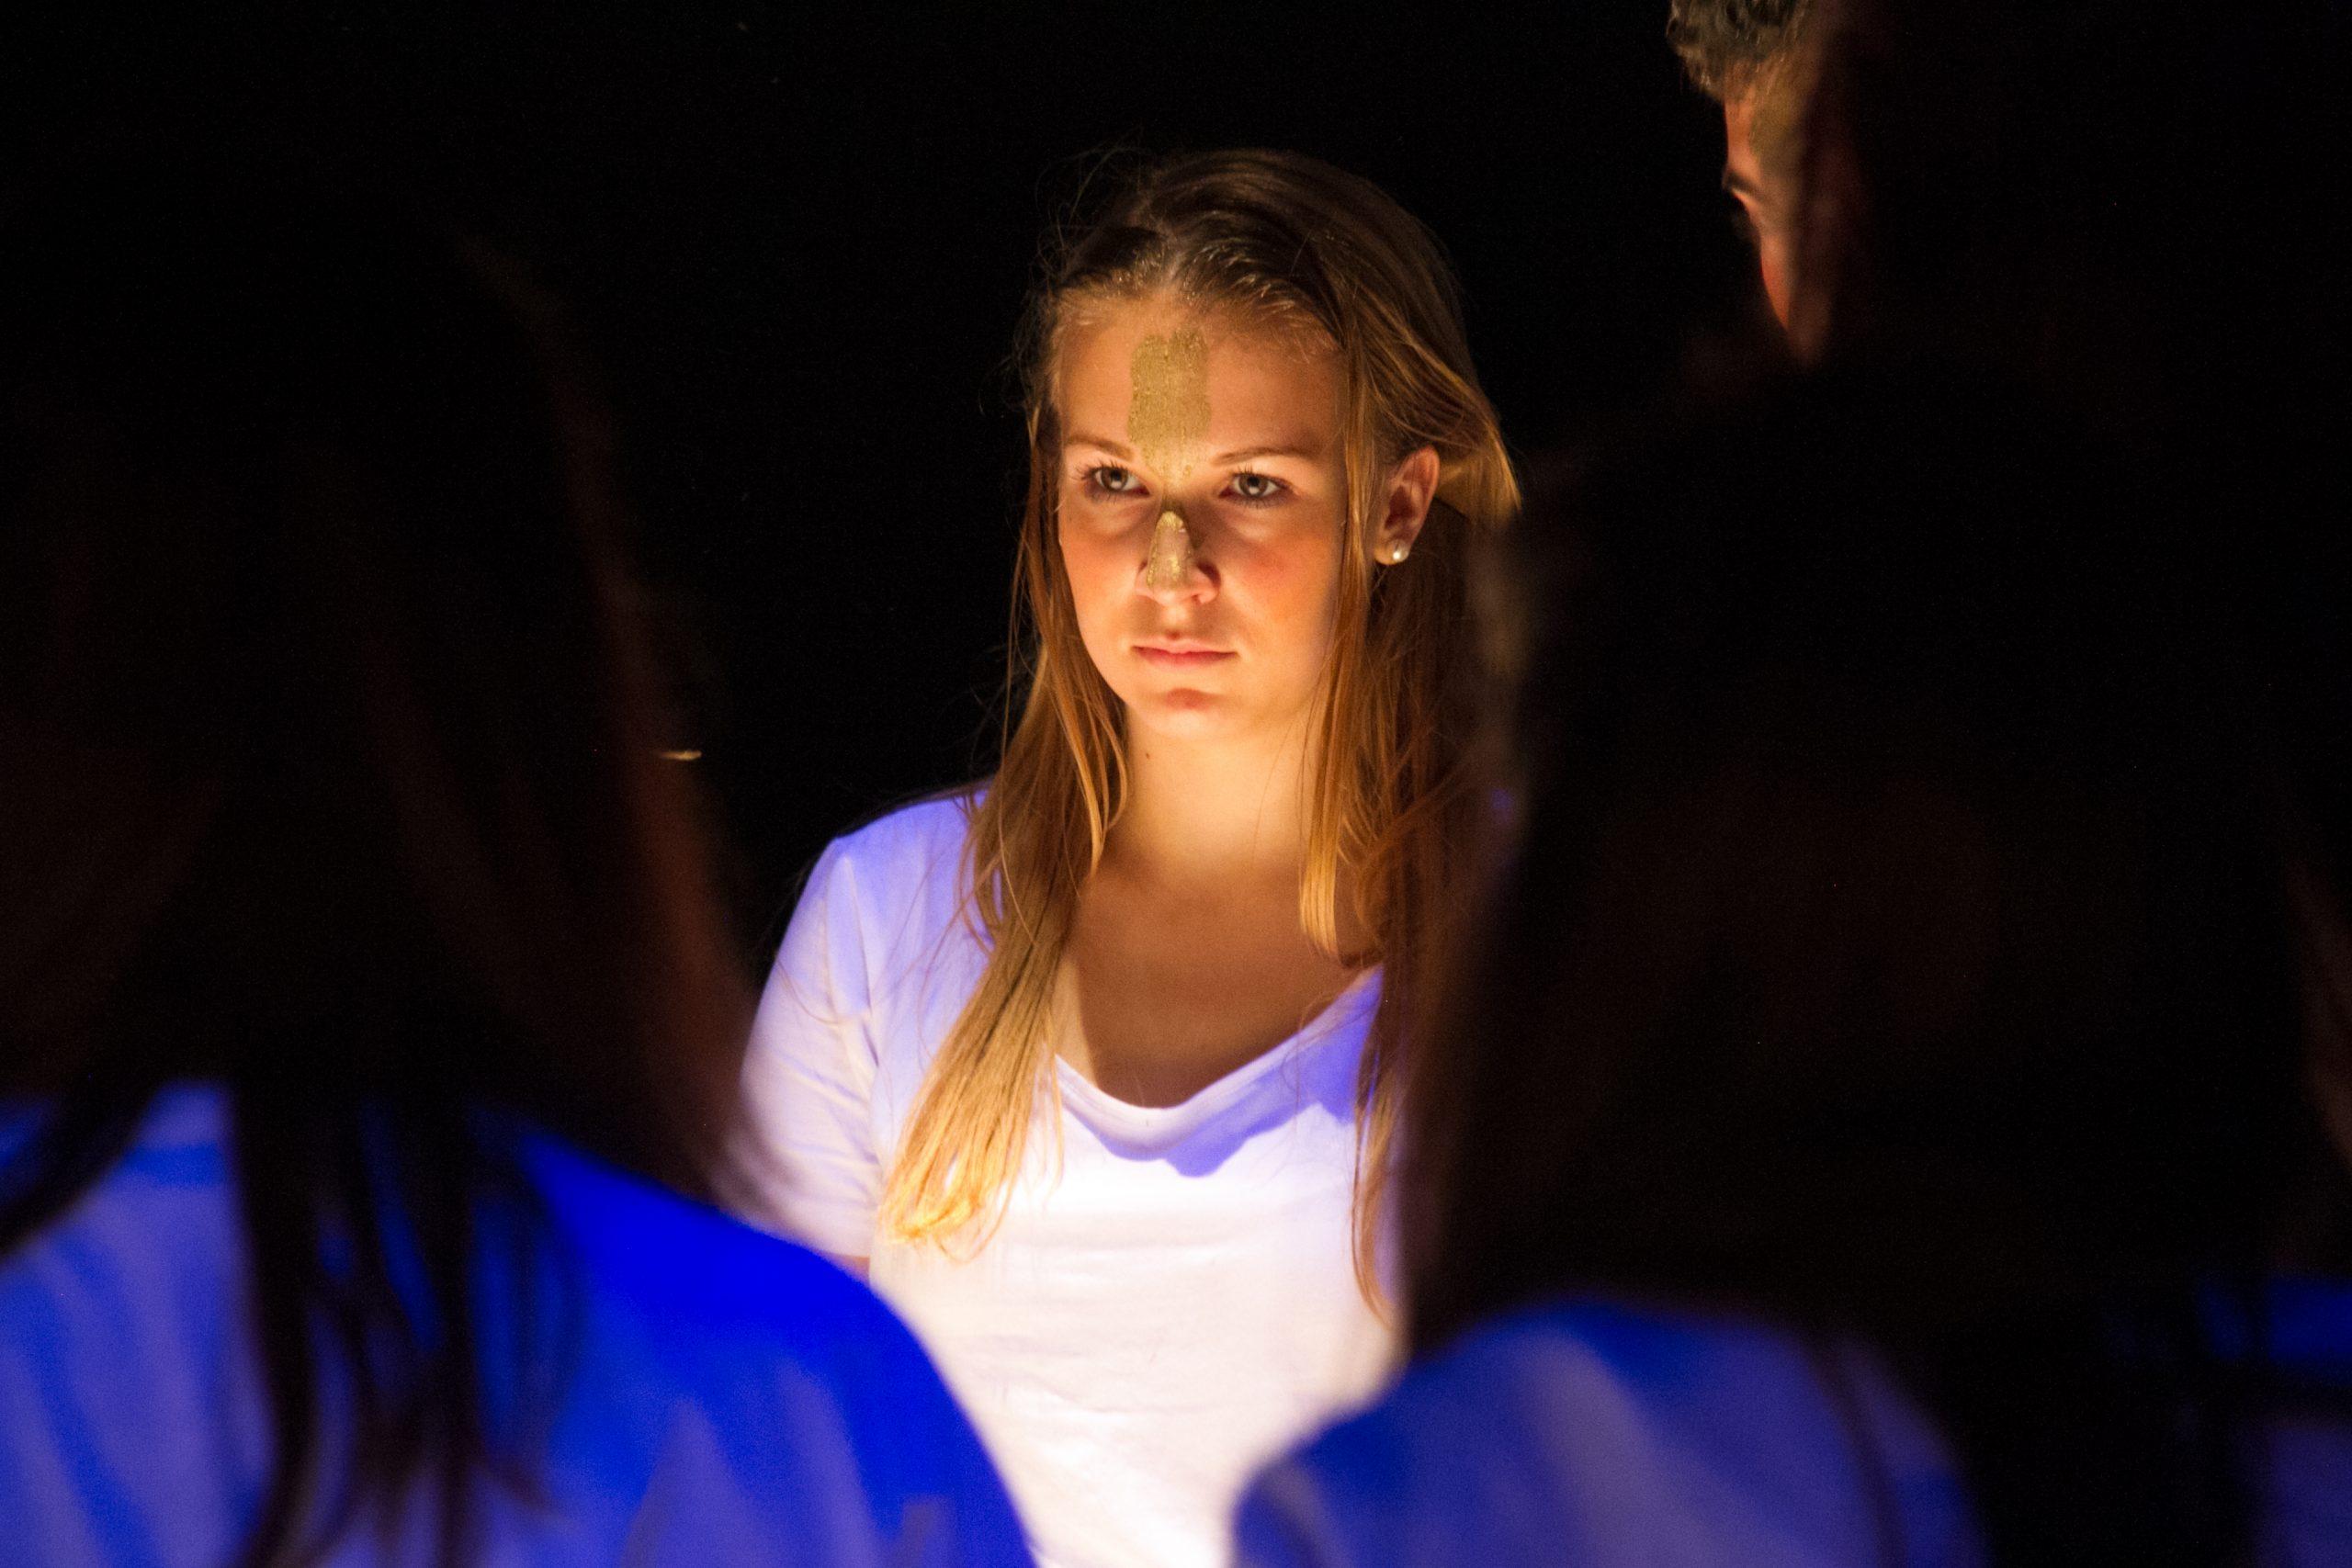 Projekt Parzival Jugendclub Schauspieler